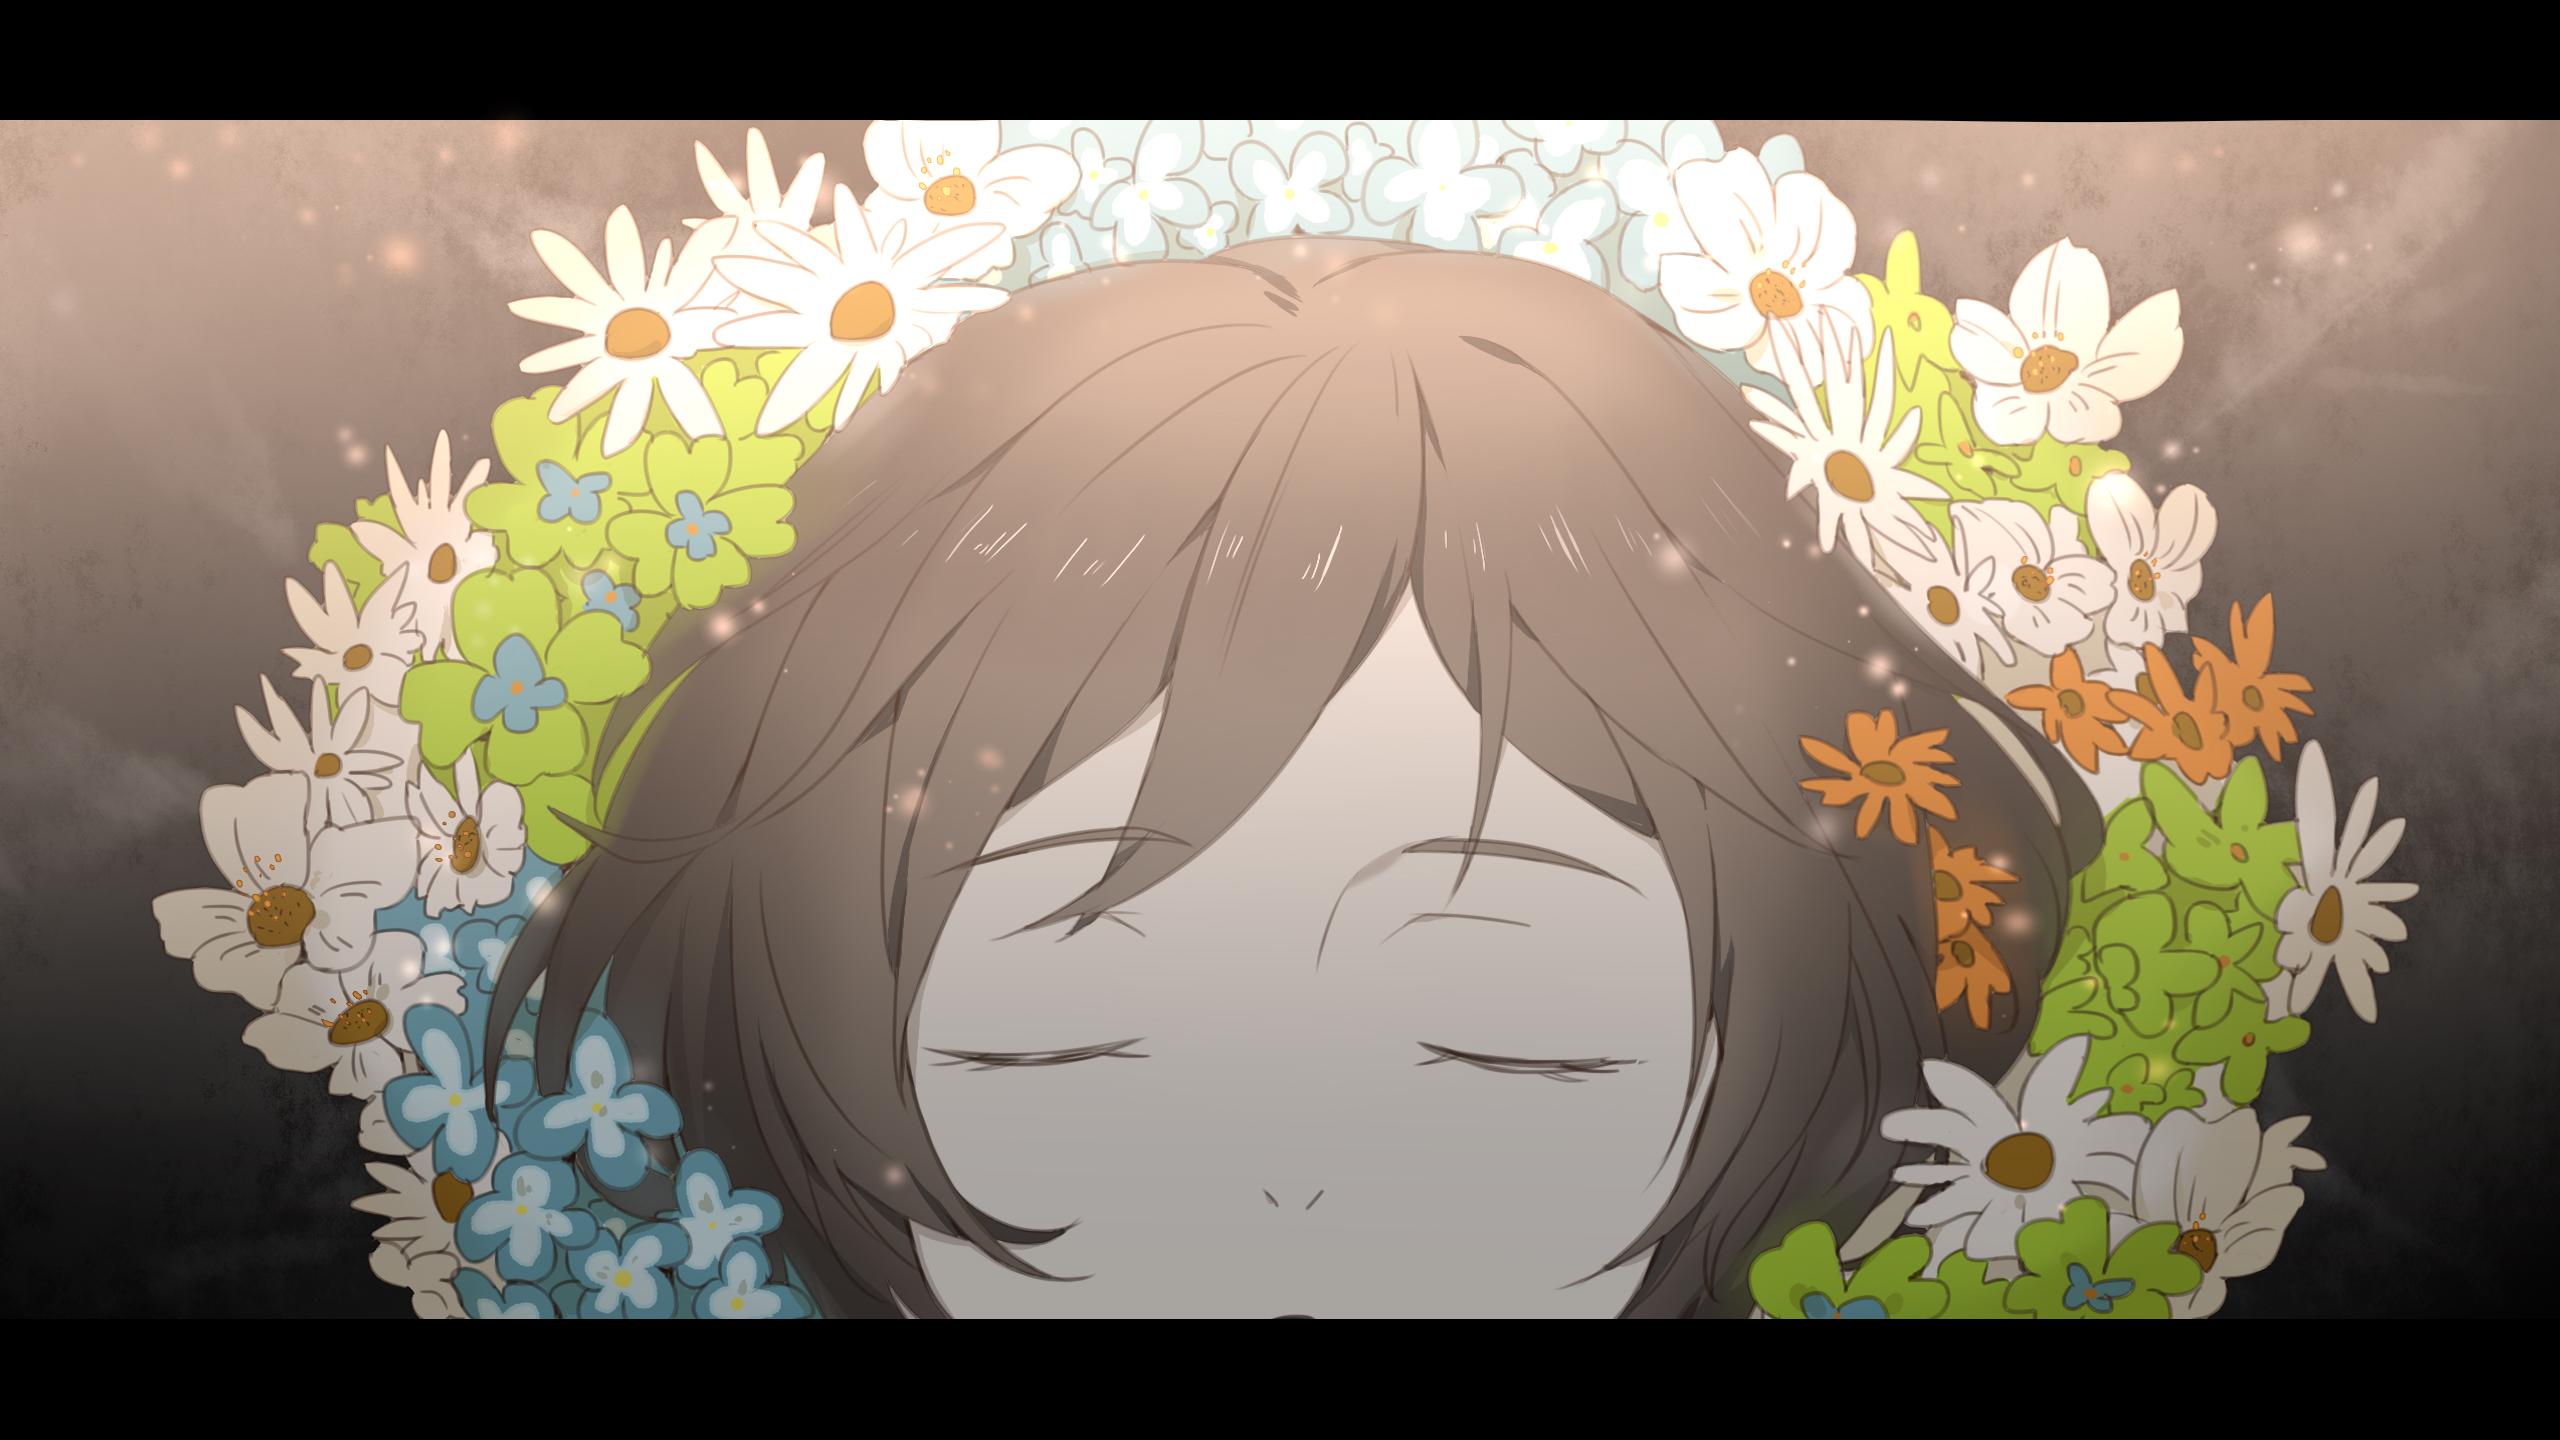 Wallpaper Devilman Crybaby Anime Girls Miki Makimura 2560x1440